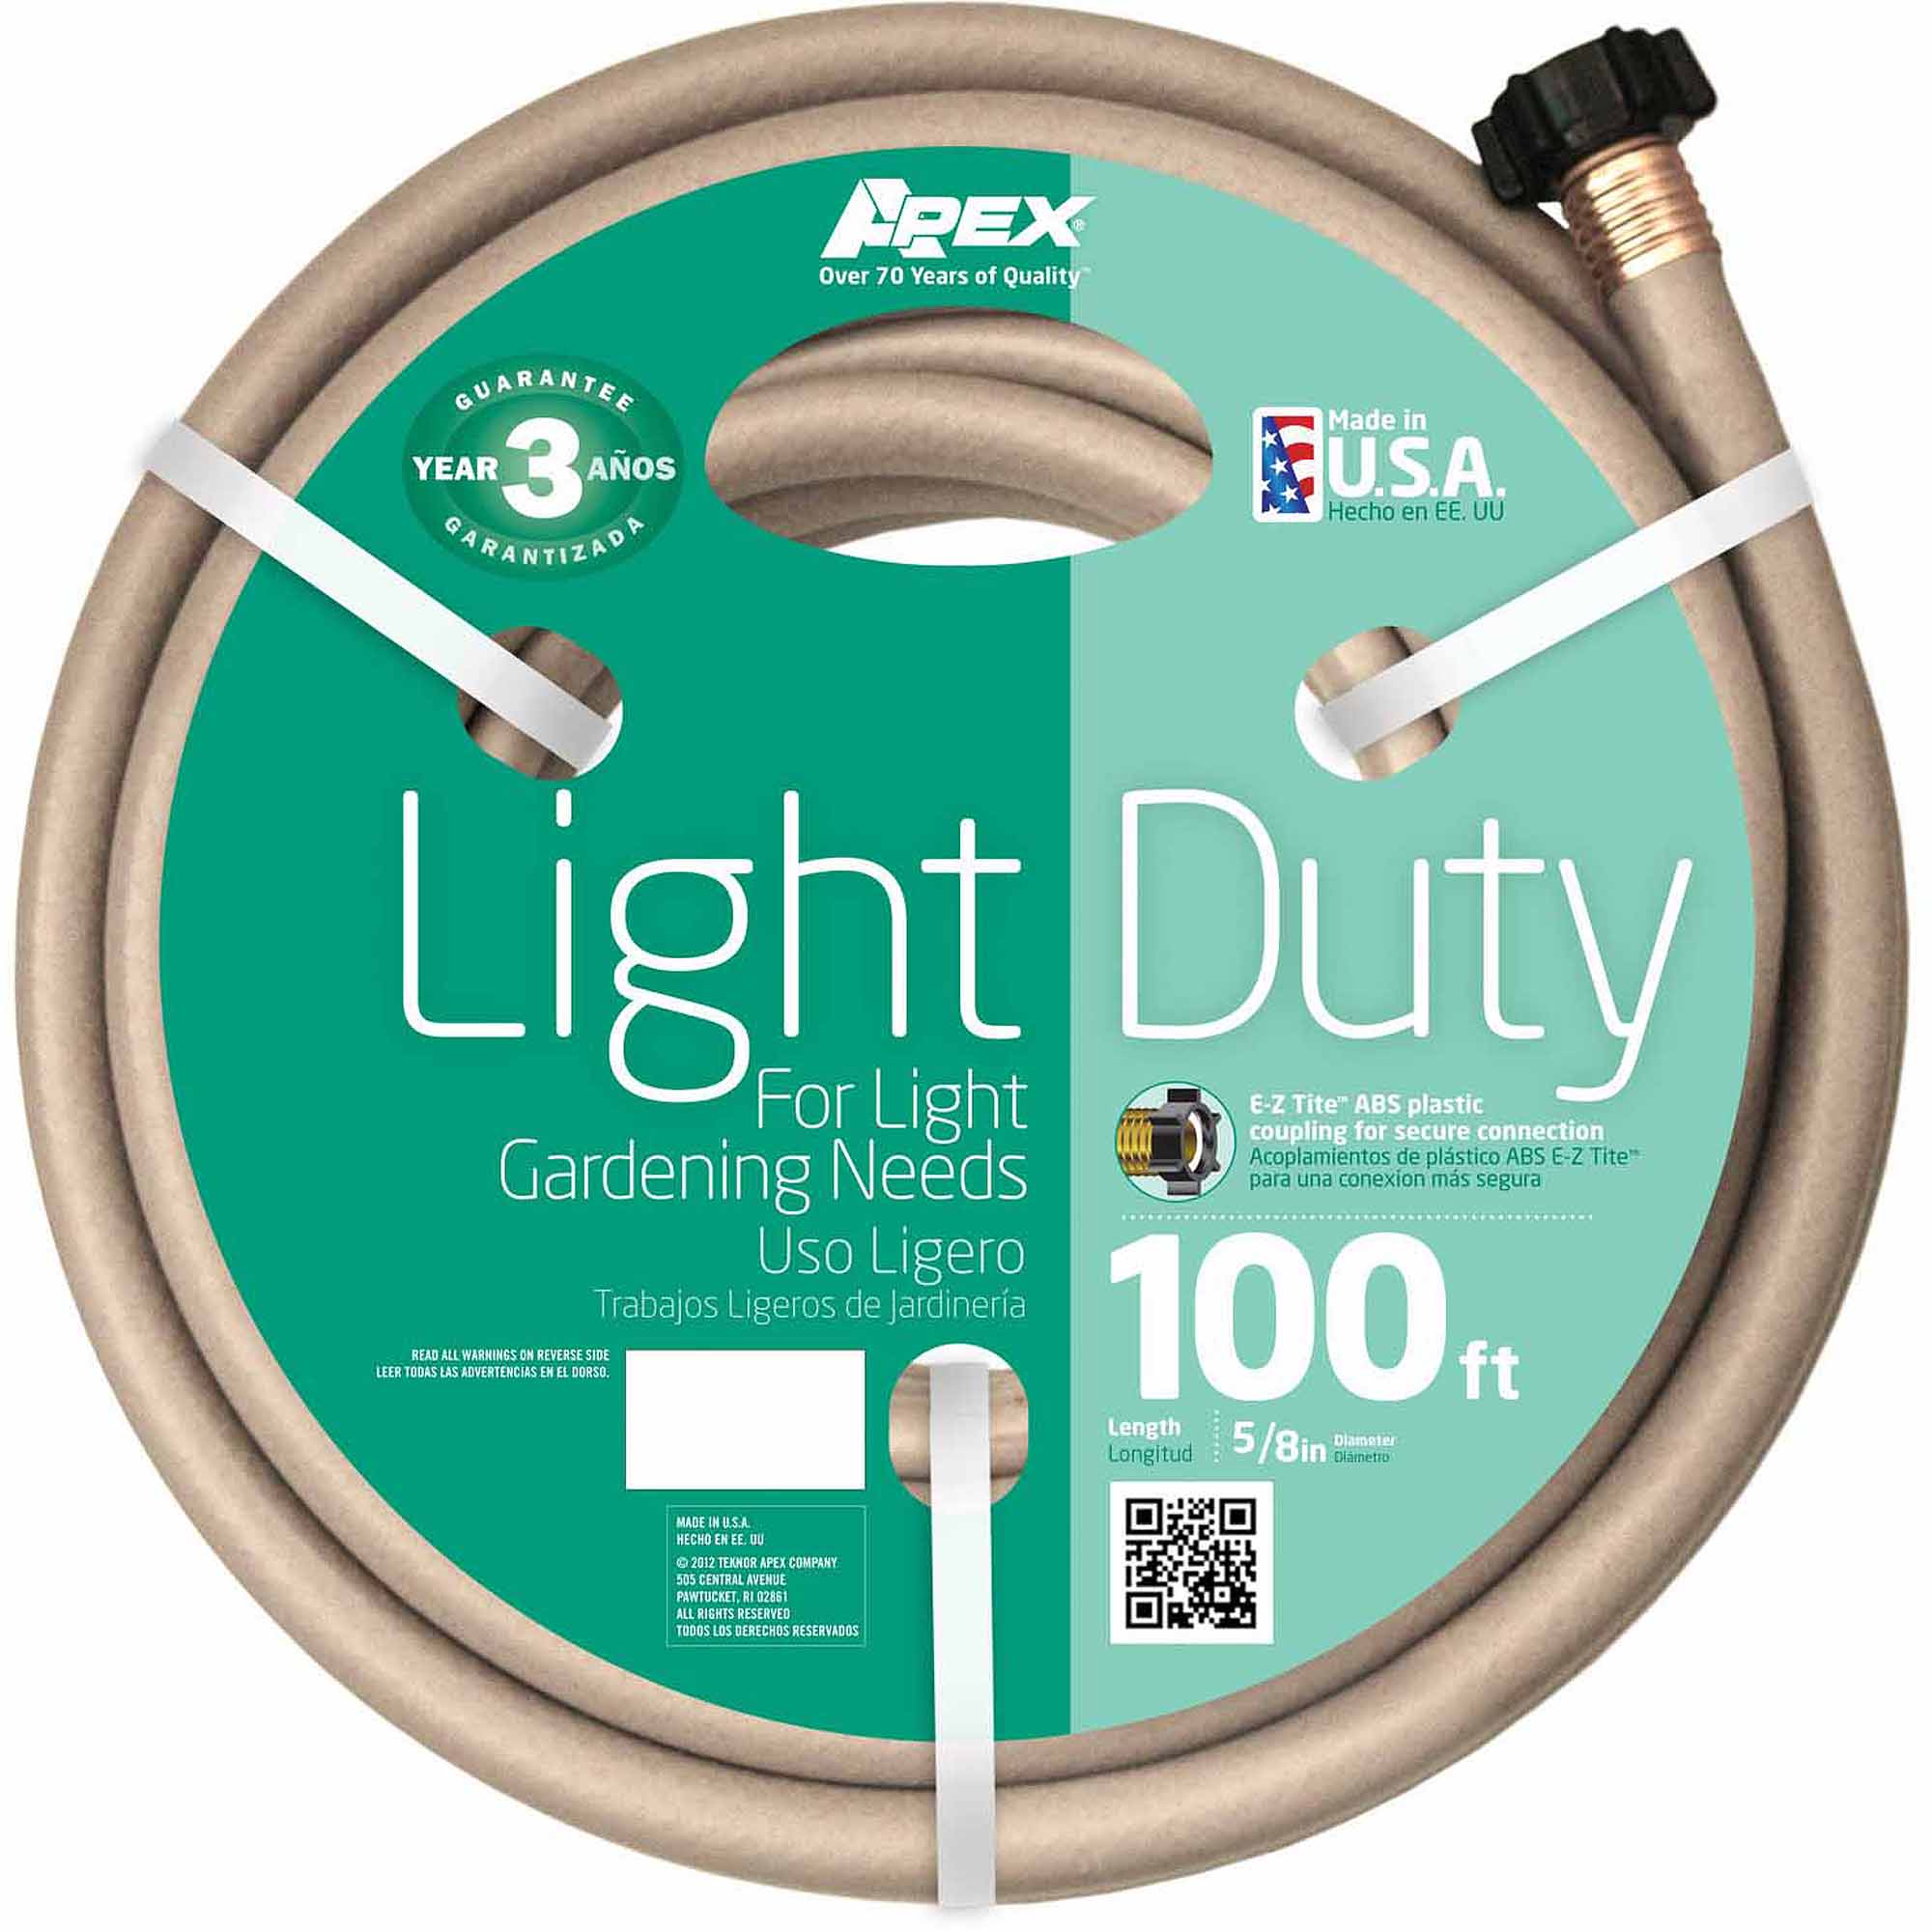 "Teknor Apex 8400-100 5/8"" x 100' Light Duty Garden Hose"